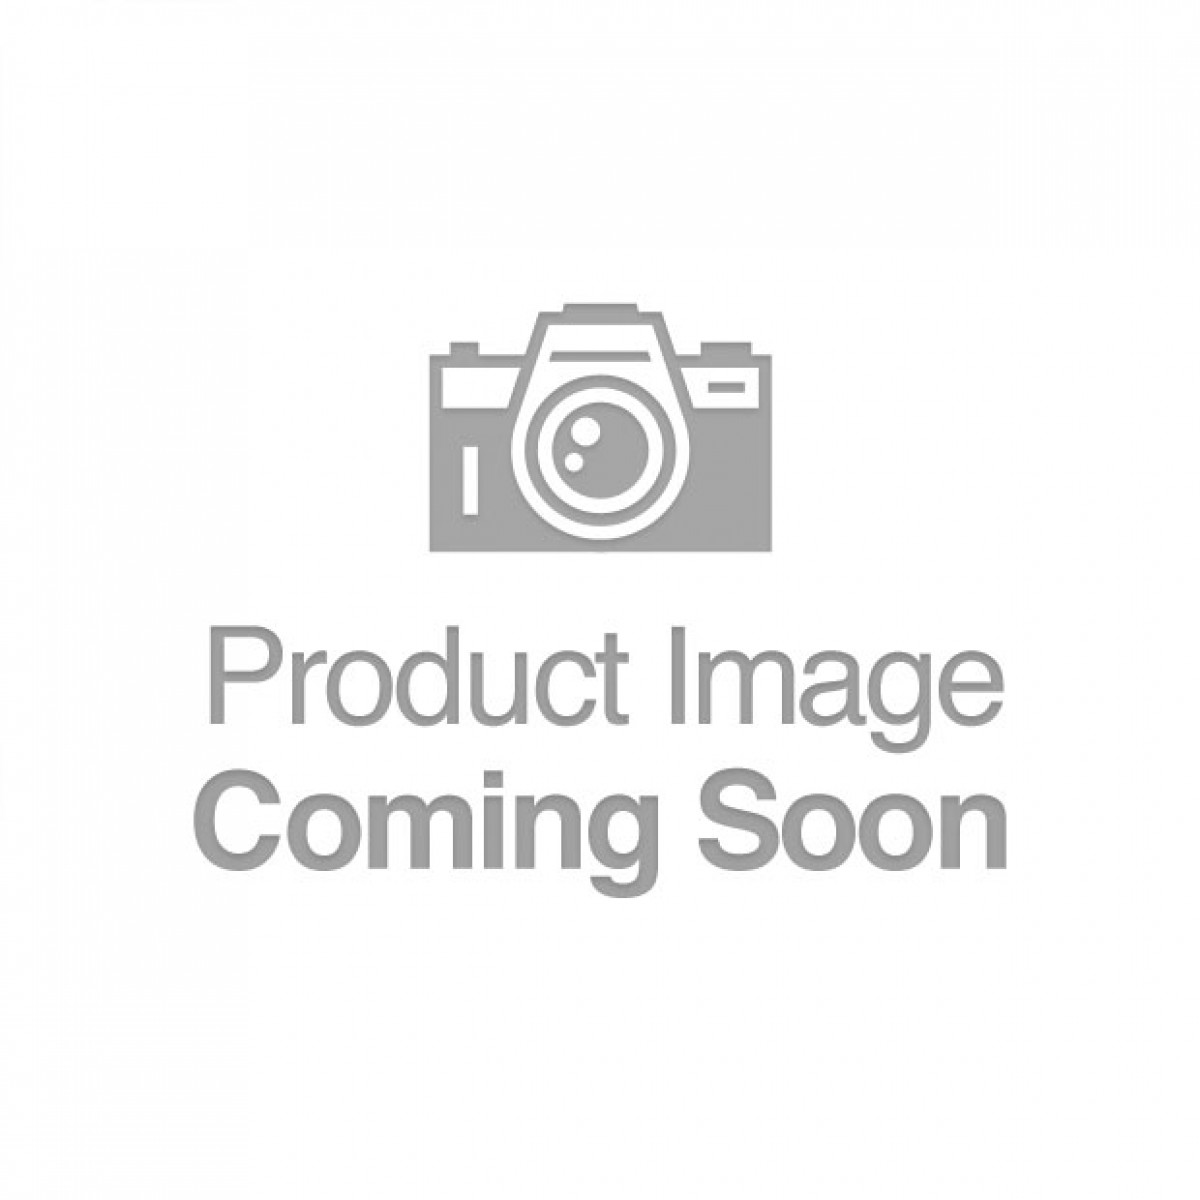 Nexus B-Stroker Unisex w/Rimming Beads - Black